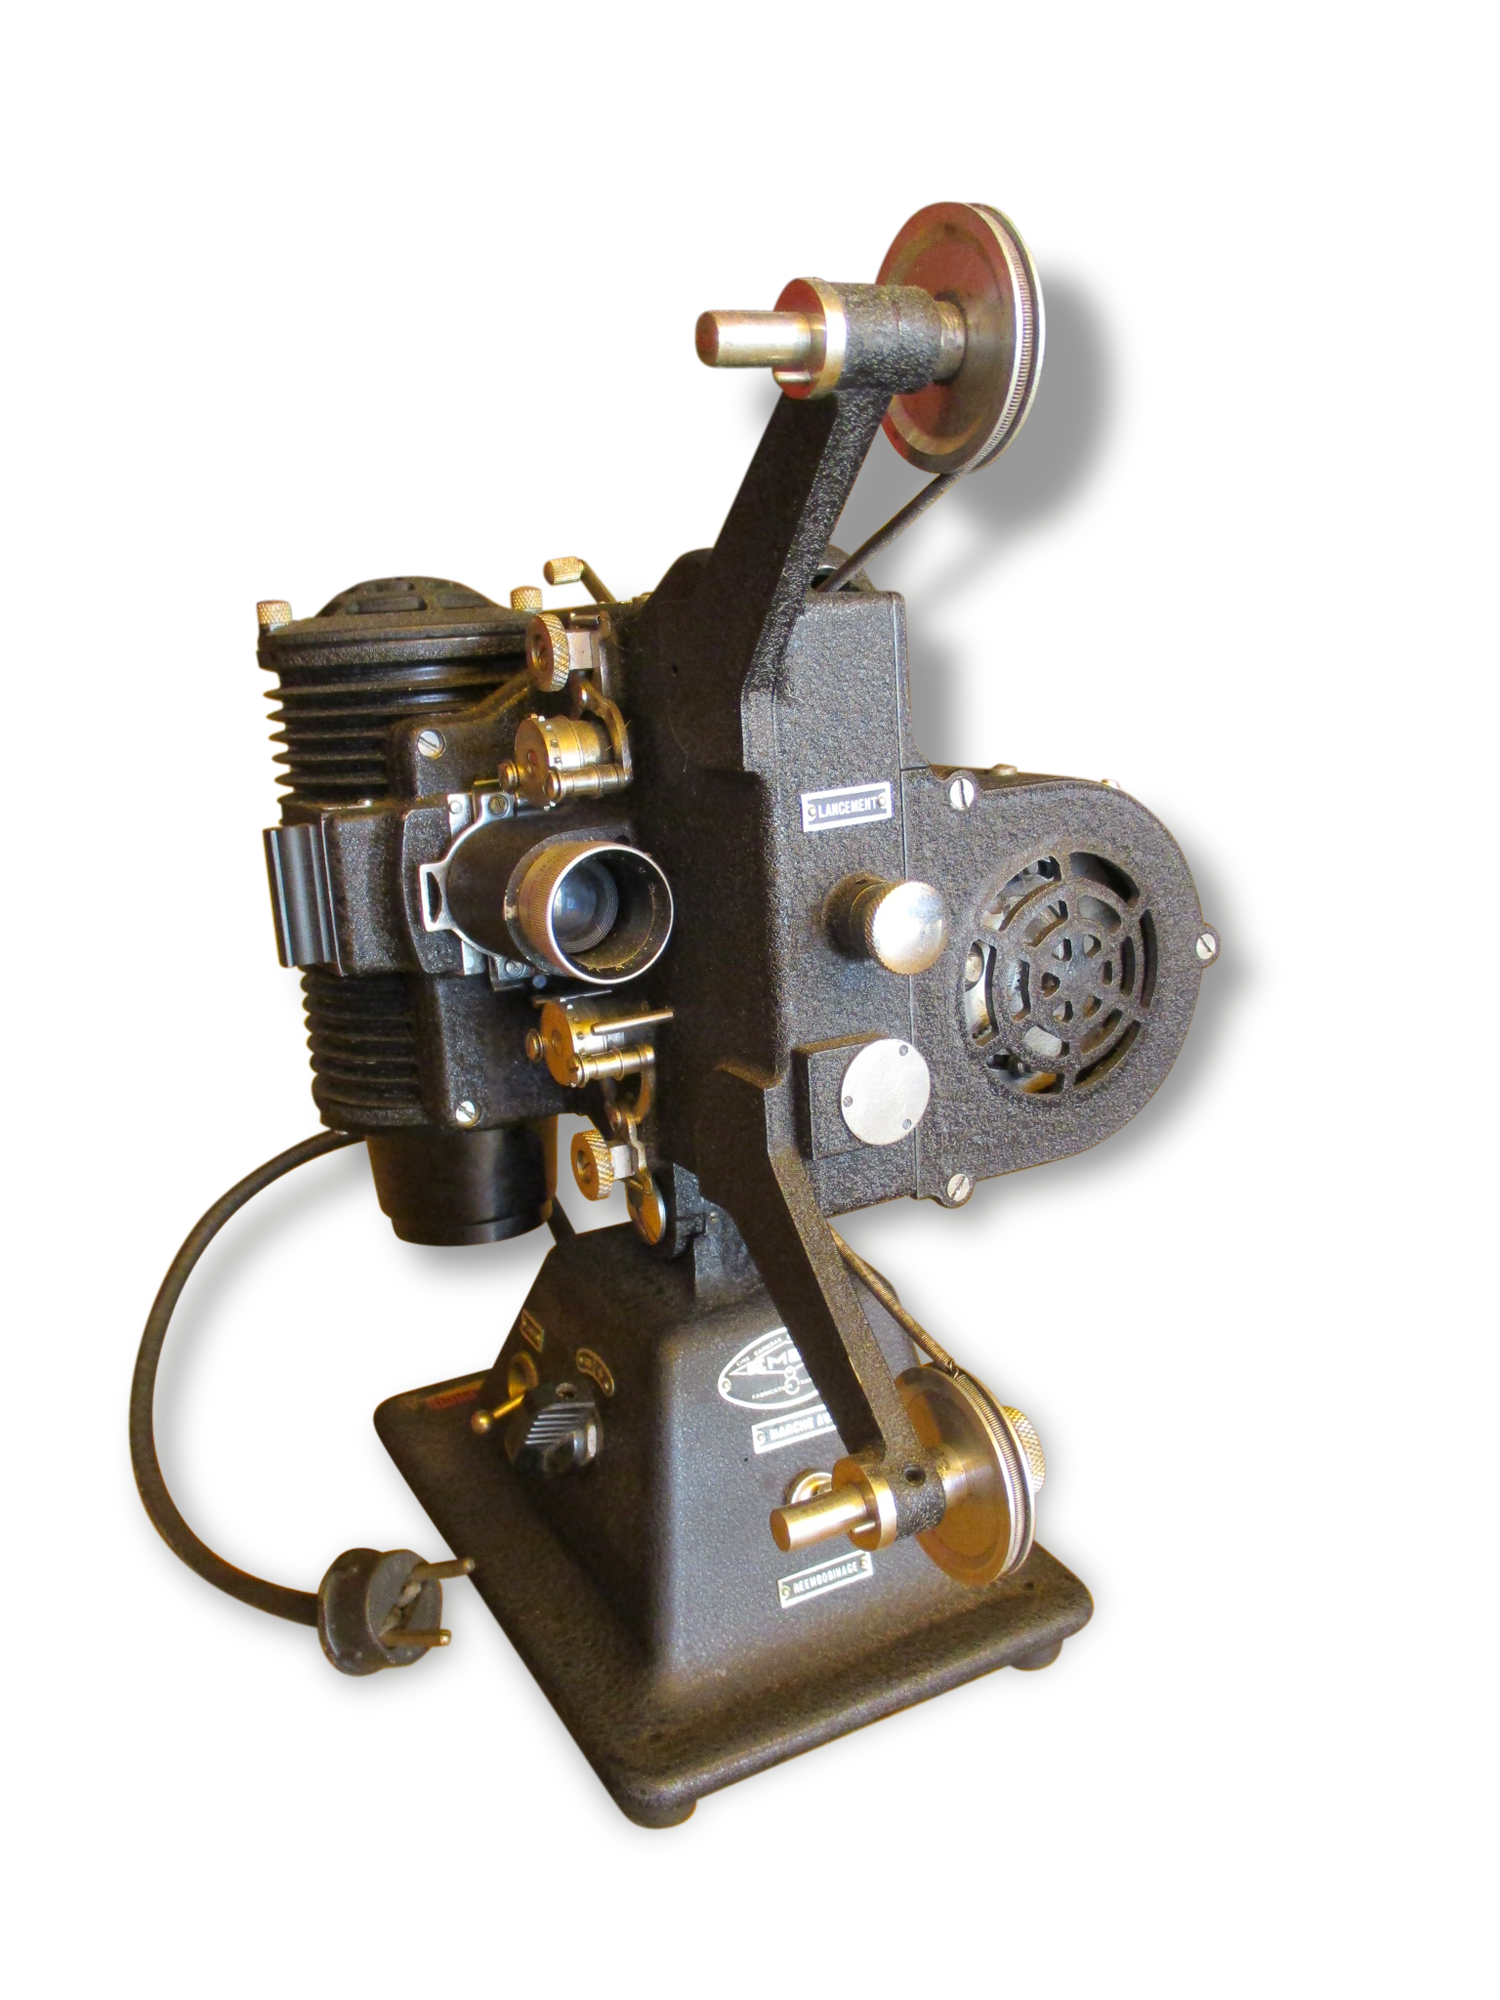 Projecteur EMEL de1956 -8mm